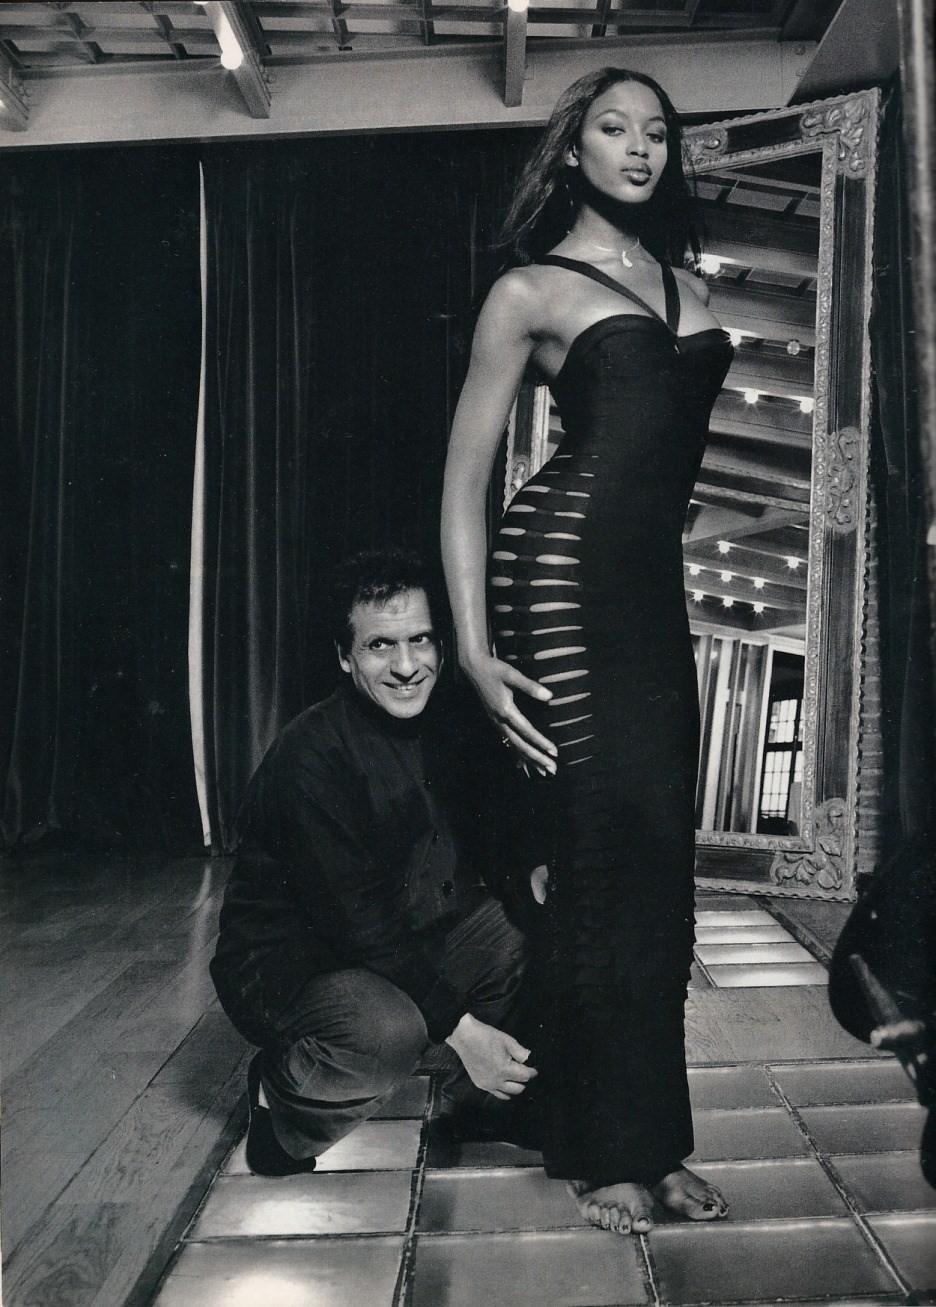 "Naomi稱已故設計師Azzedine Alaïa為""Papa"",可見她對他的尊敬。"